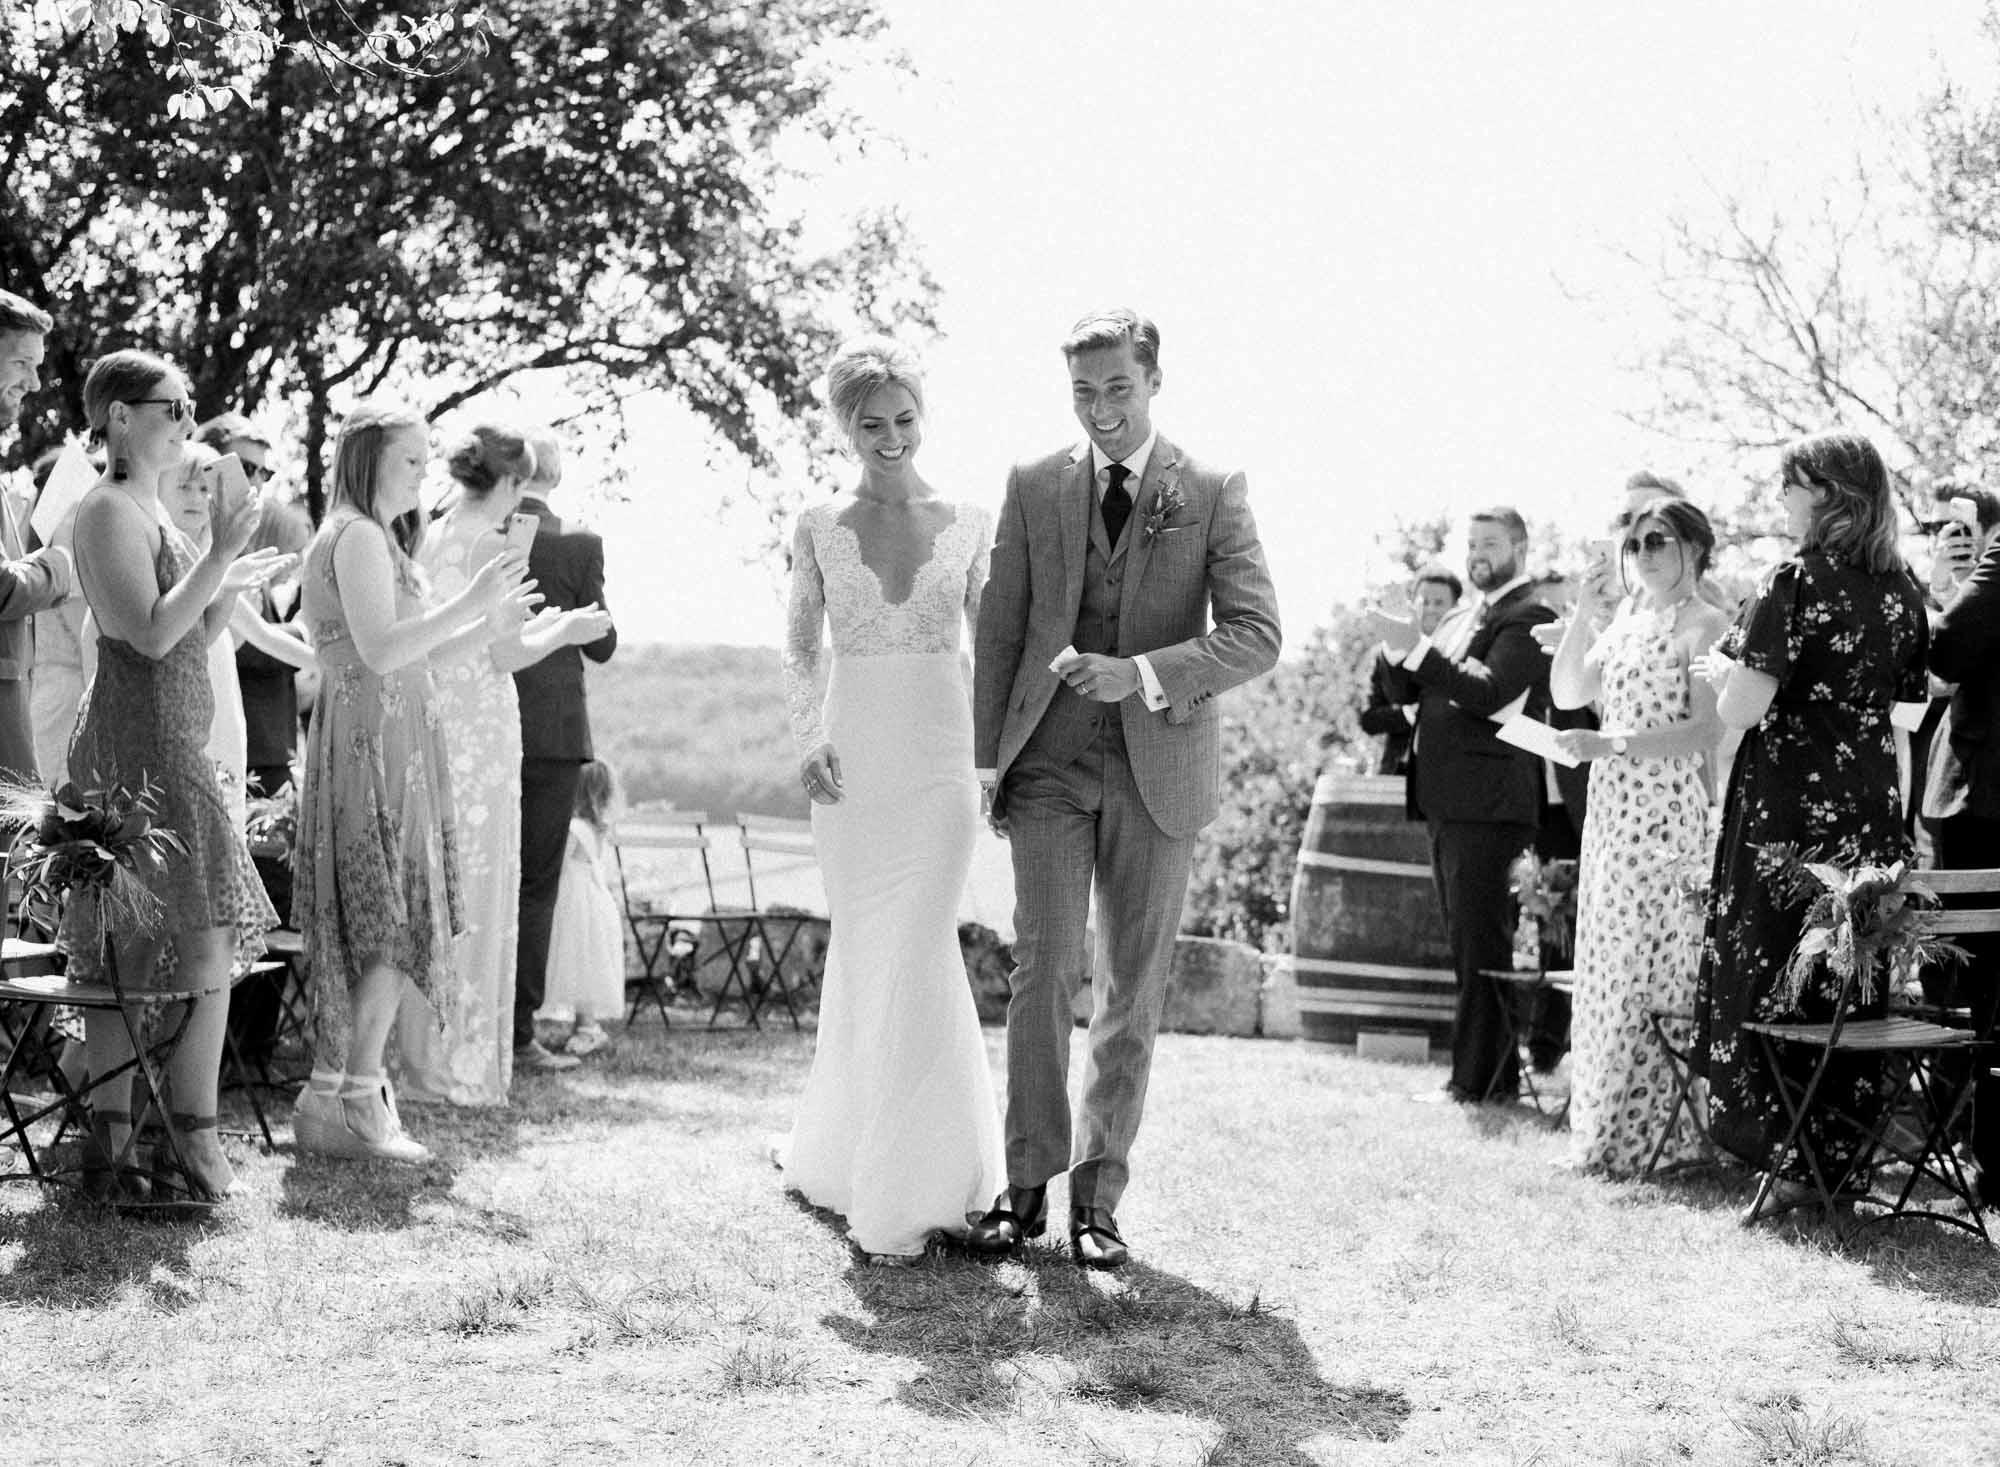 gascony_french_wedding-42.jpg